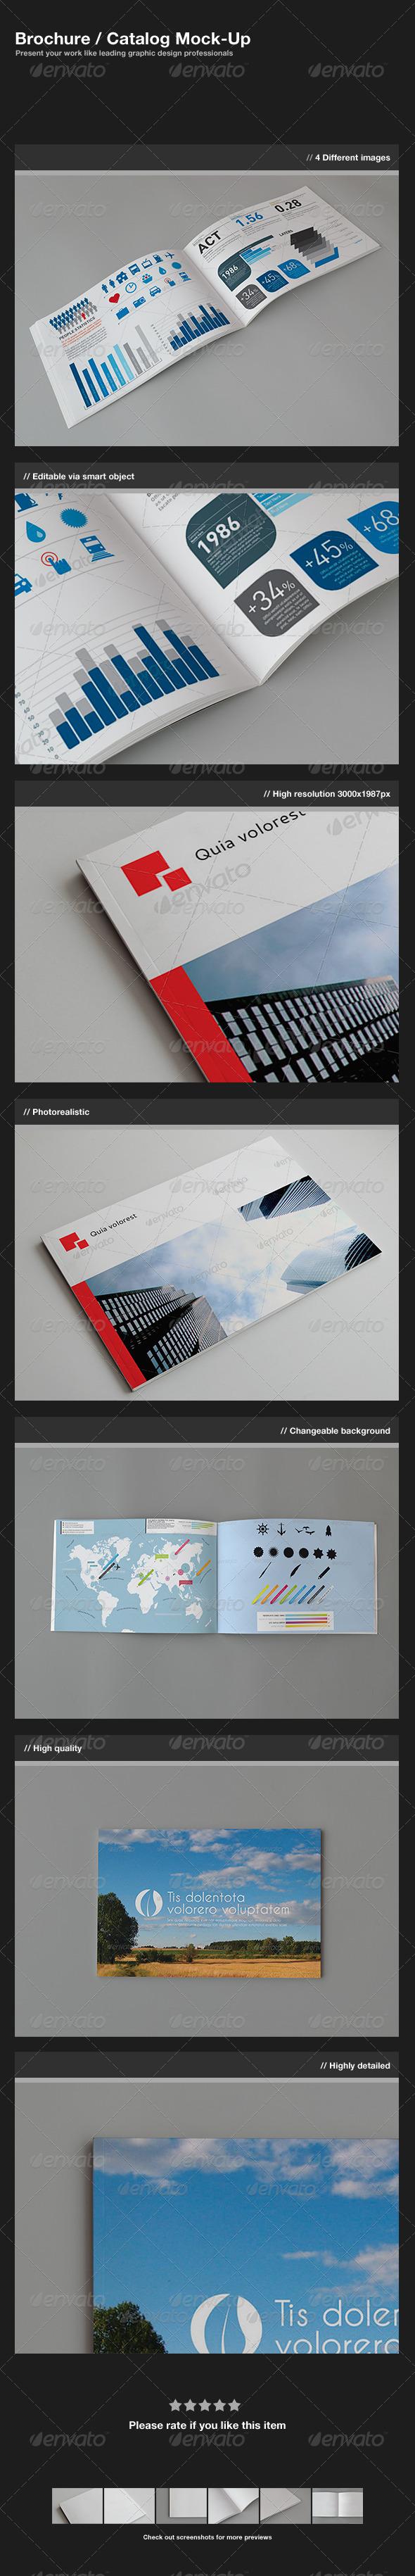 GraphicRiver Brochure Catalog Mock-Up 1583241